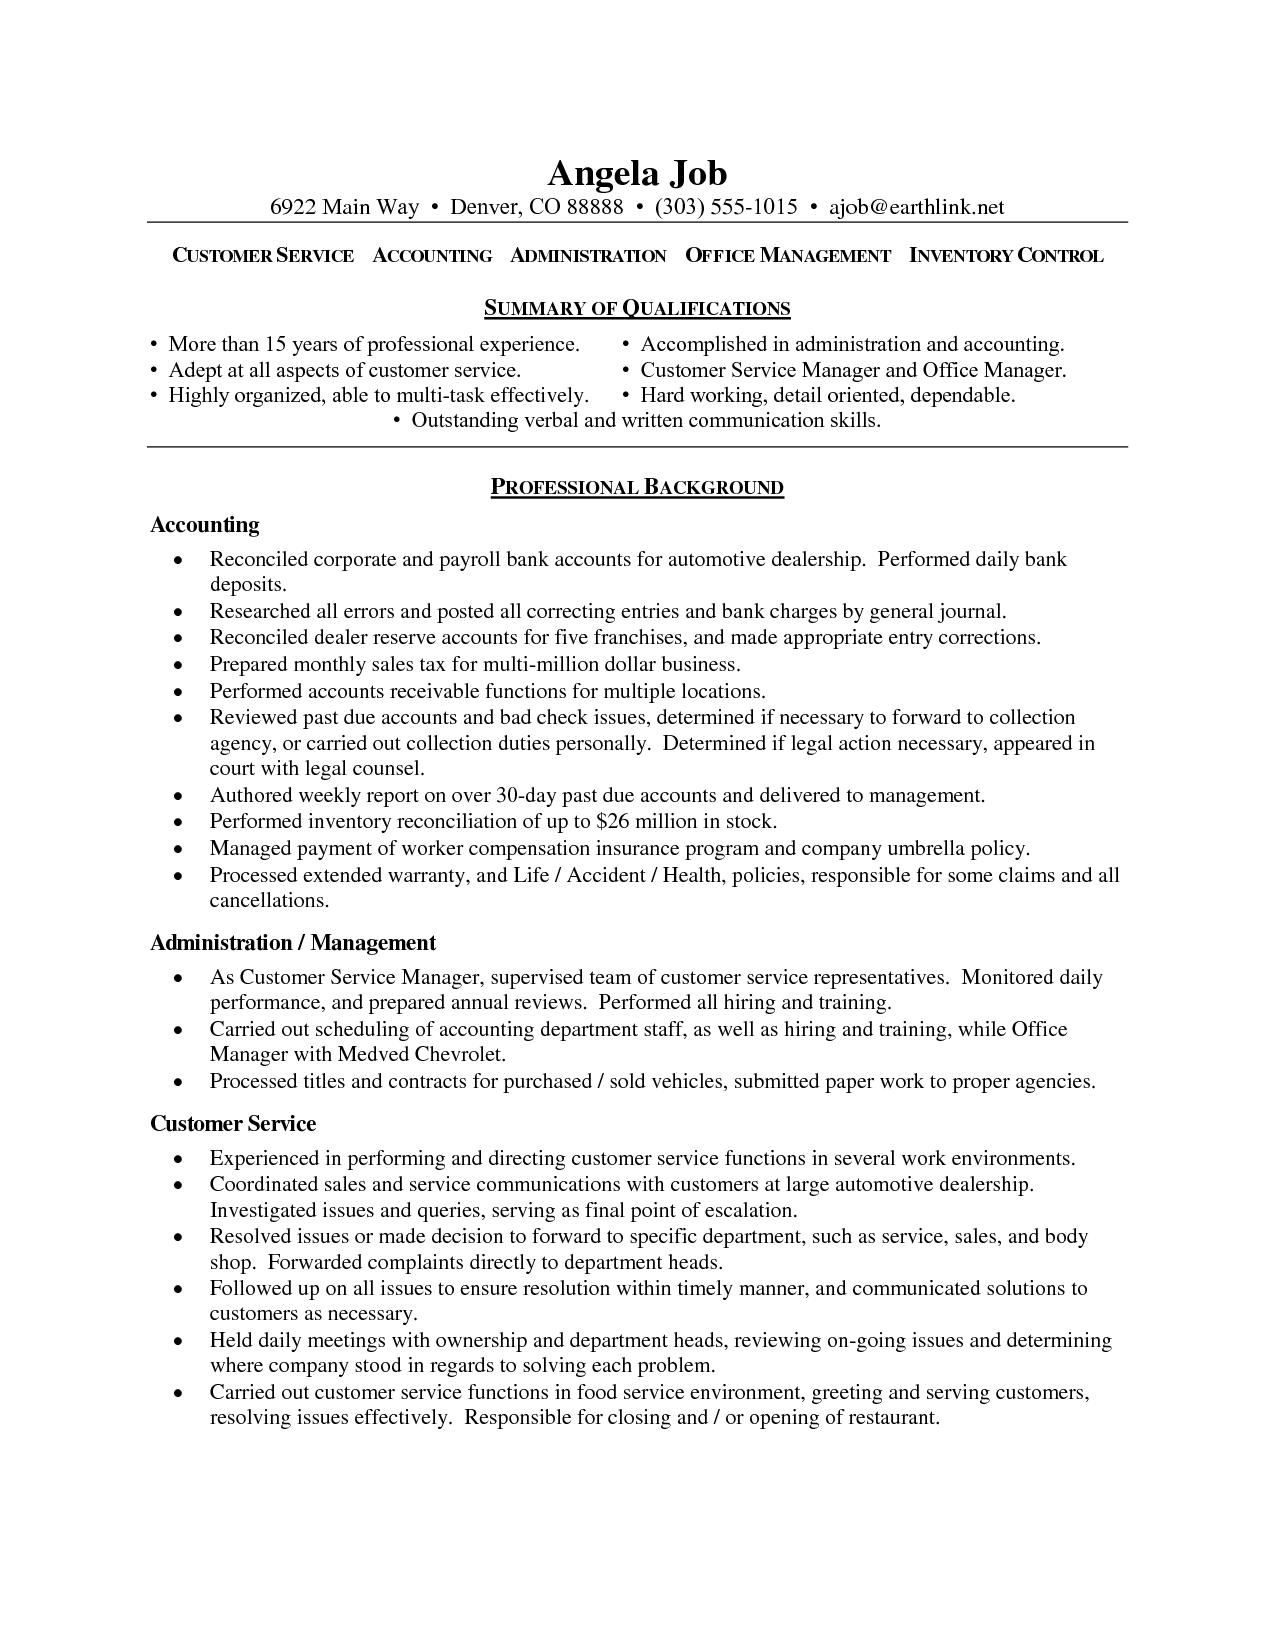 Customer Service Resume 3 Customer Service Resume Examples Customer Service Resume Office Manager Resume